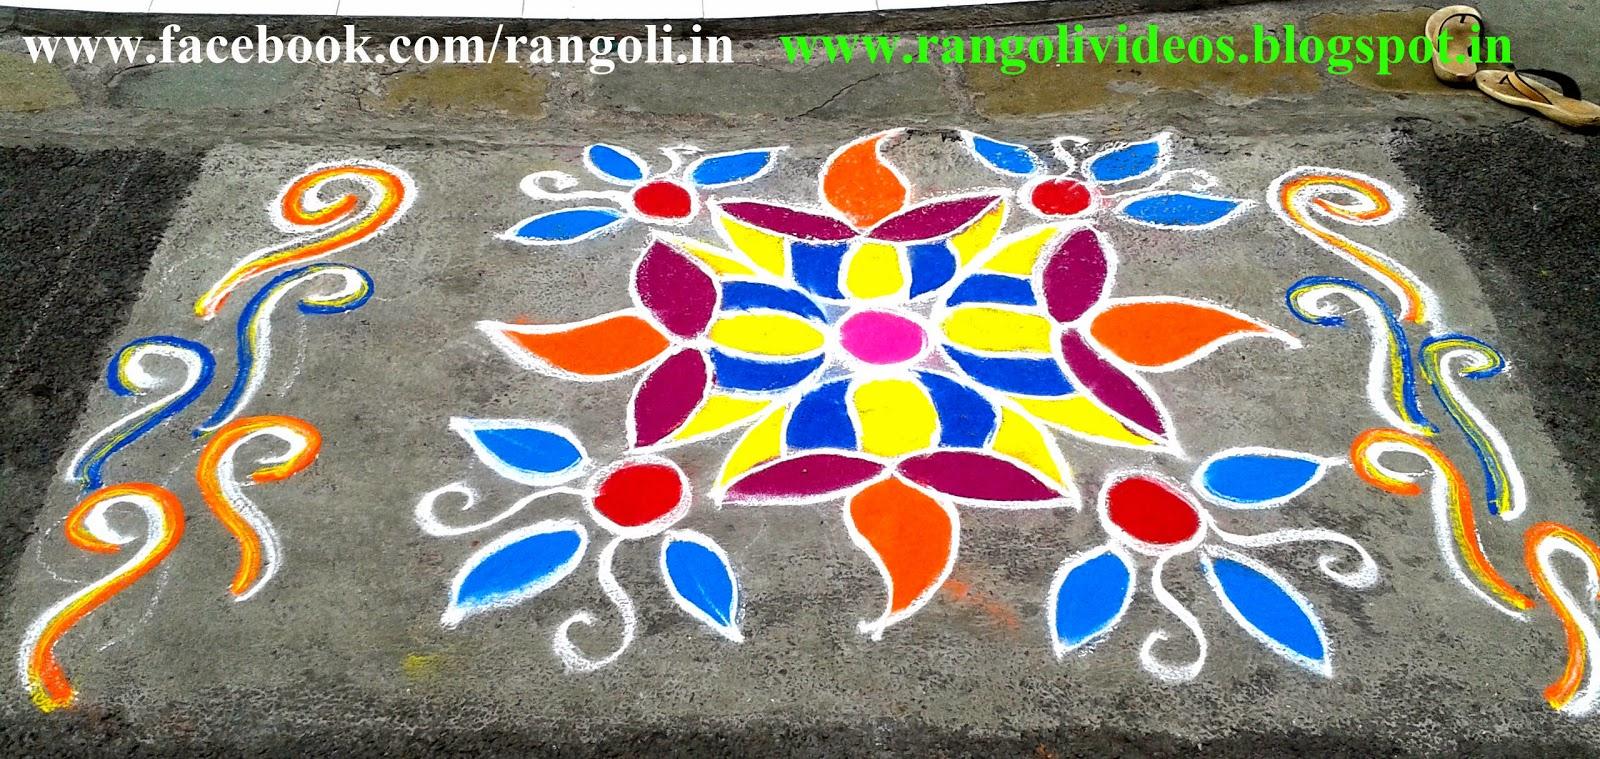 Diwali Rangoli , Kolam , Designs Images: Diwali 2013 rangoli designs